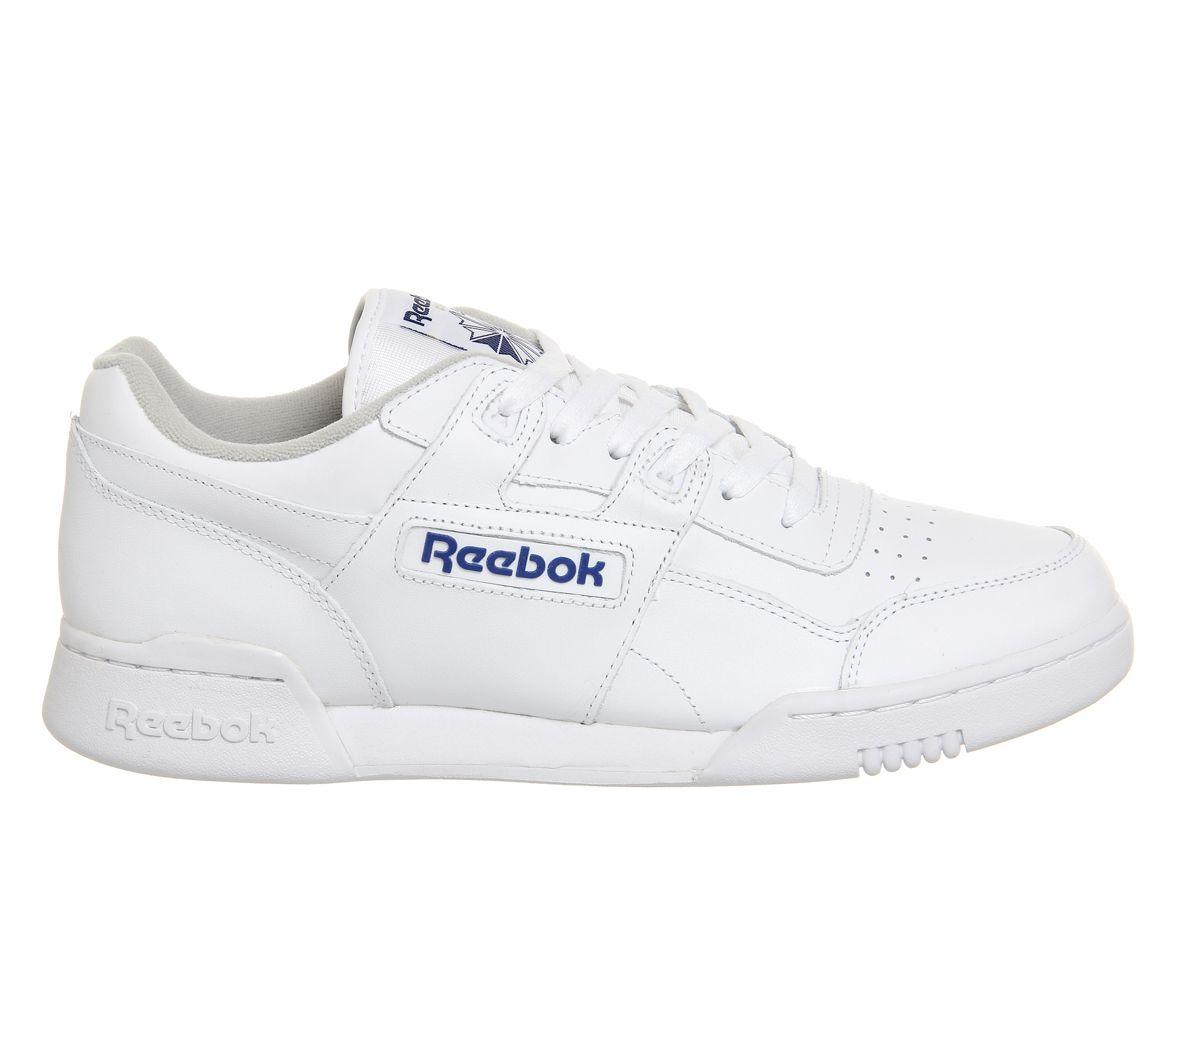 online store 1f280 367c6 Reebok-Workout-Royal-Bianco-Plus-Sneakers miniatura 15